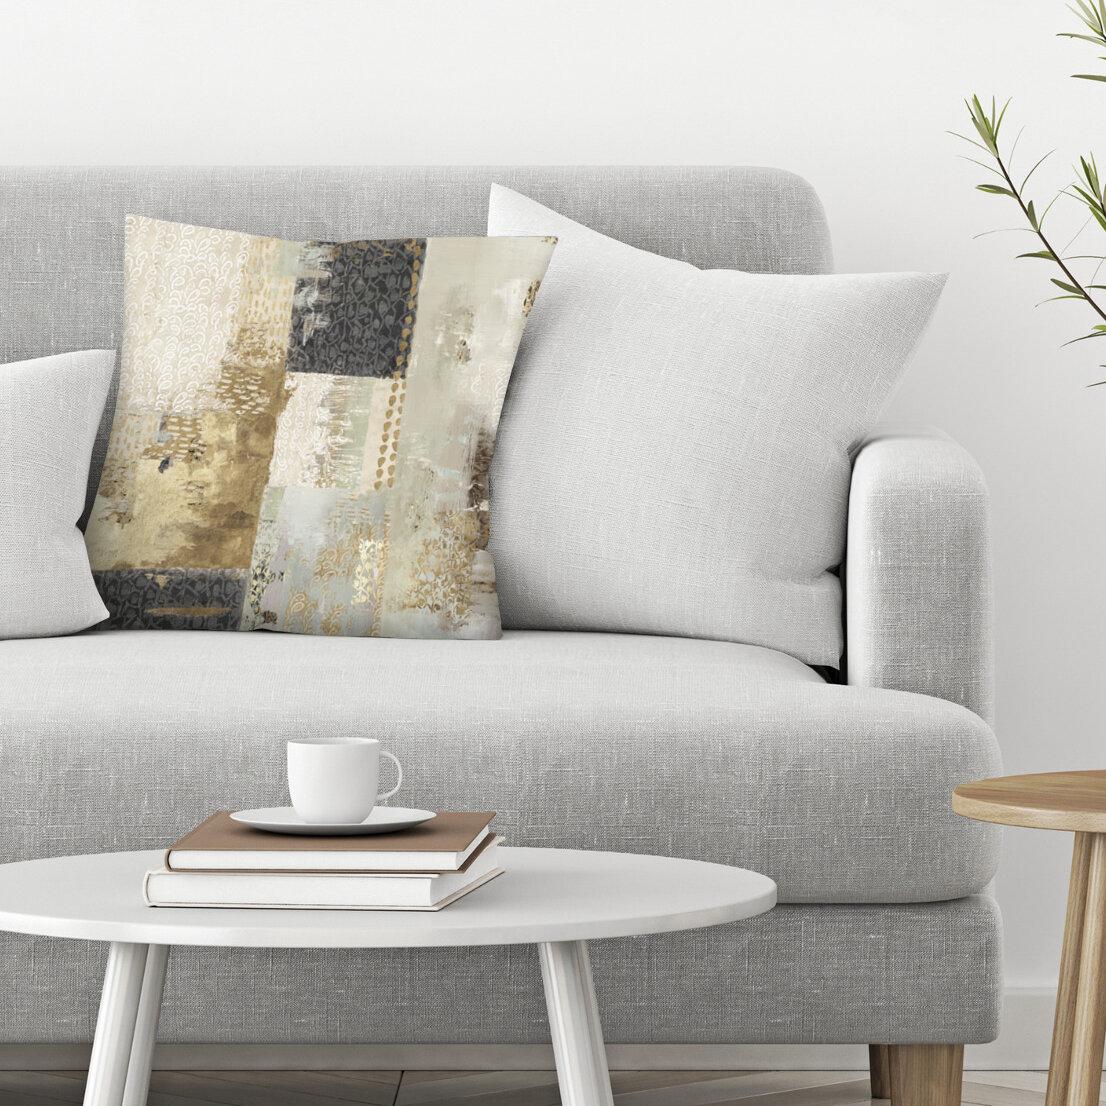 East Urban Home Bare I Throw Pillow Reviews Wayfair